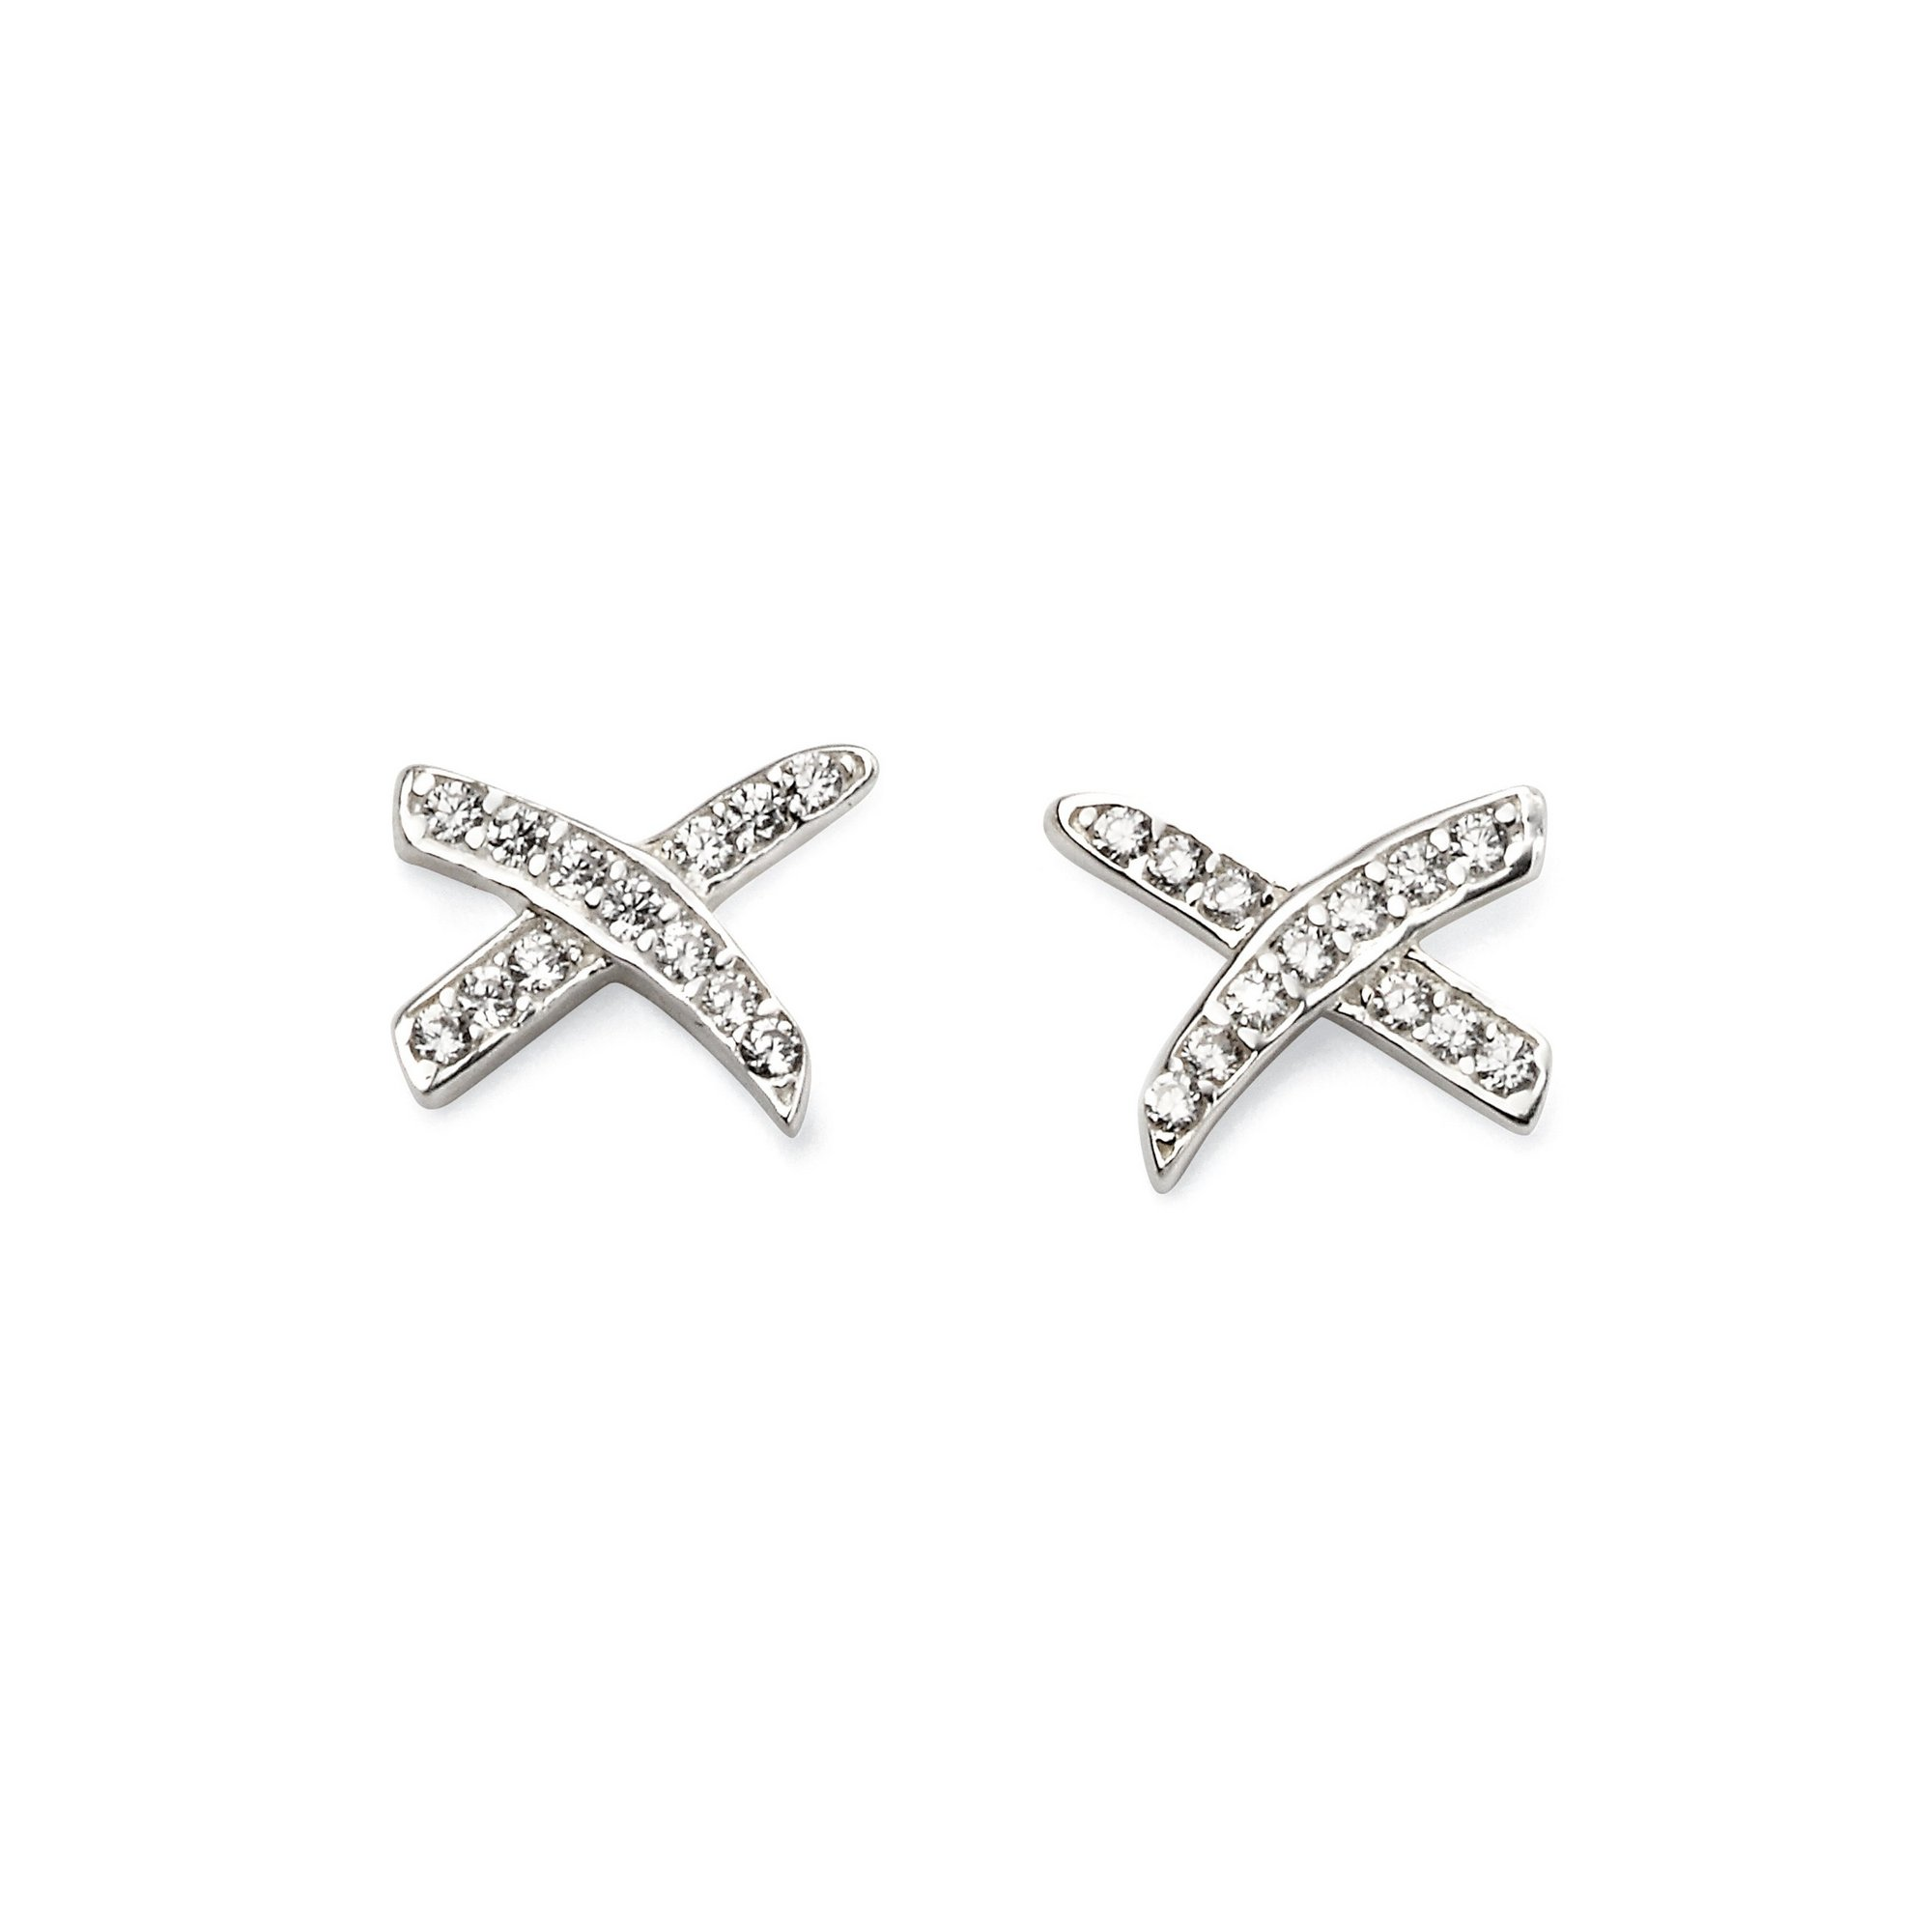 Image of Beginnings CZ Kiss Earrings